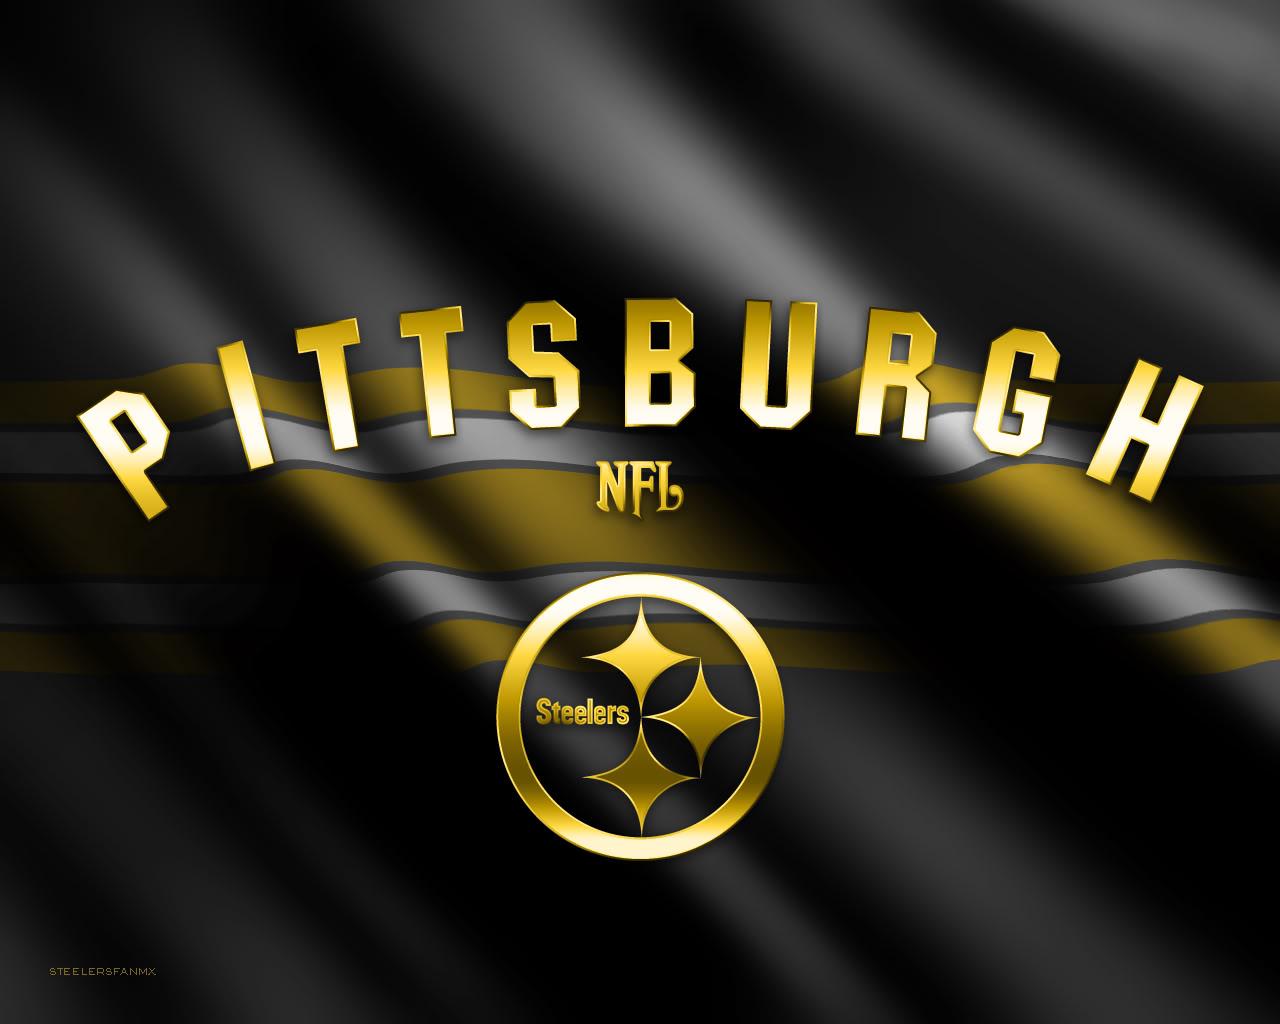 Steelers wallpaper 1280x1024 54213 1280x1024